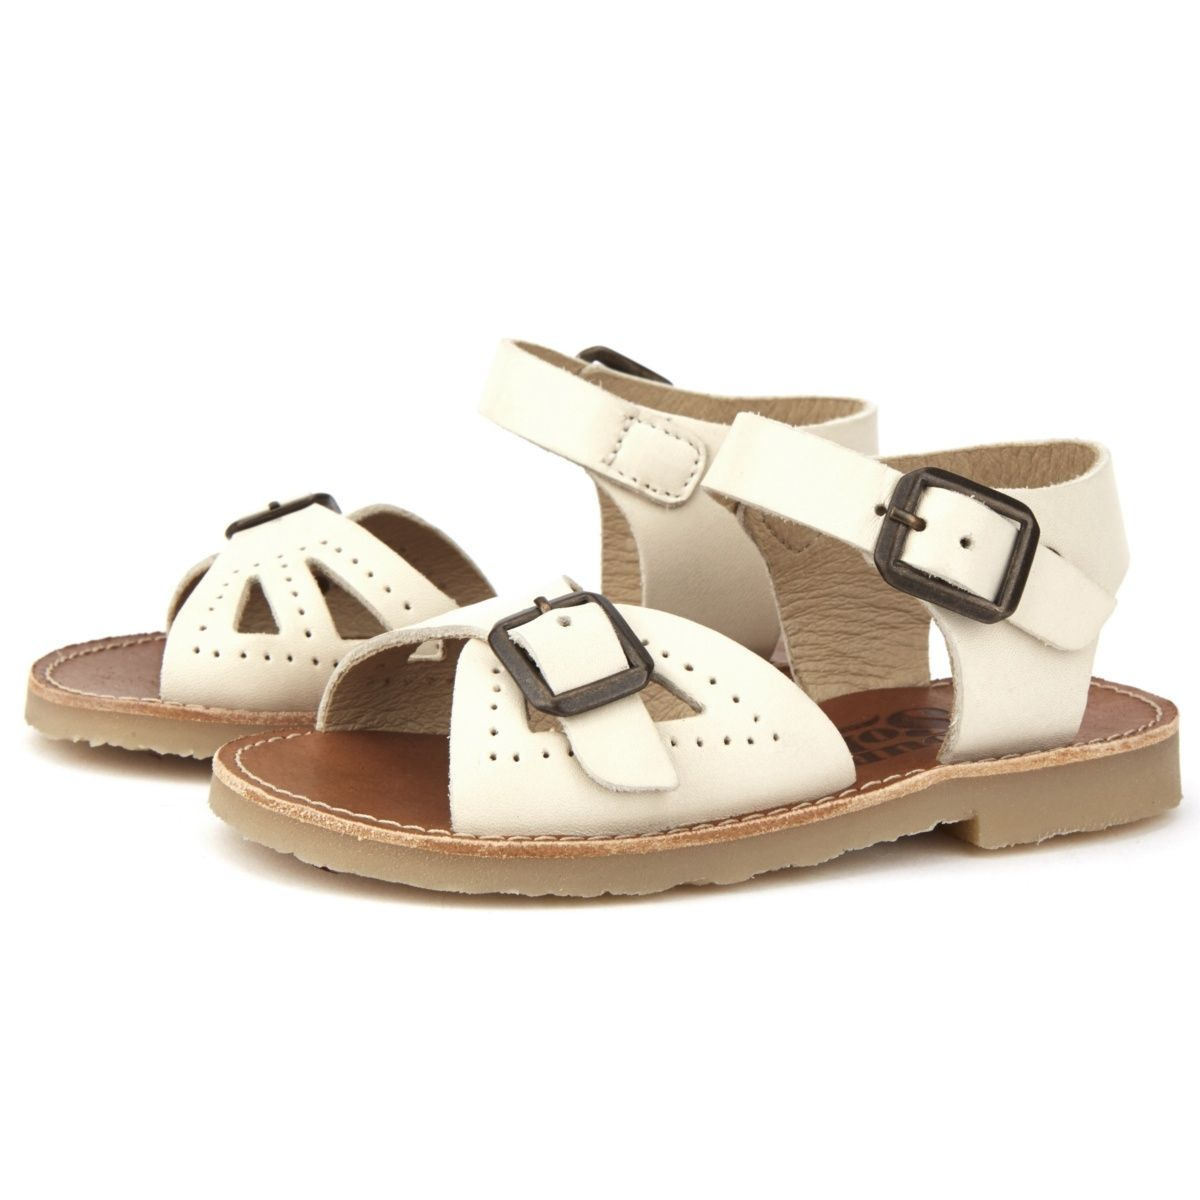 Sandały Pearl Leather ecru - Young Soles